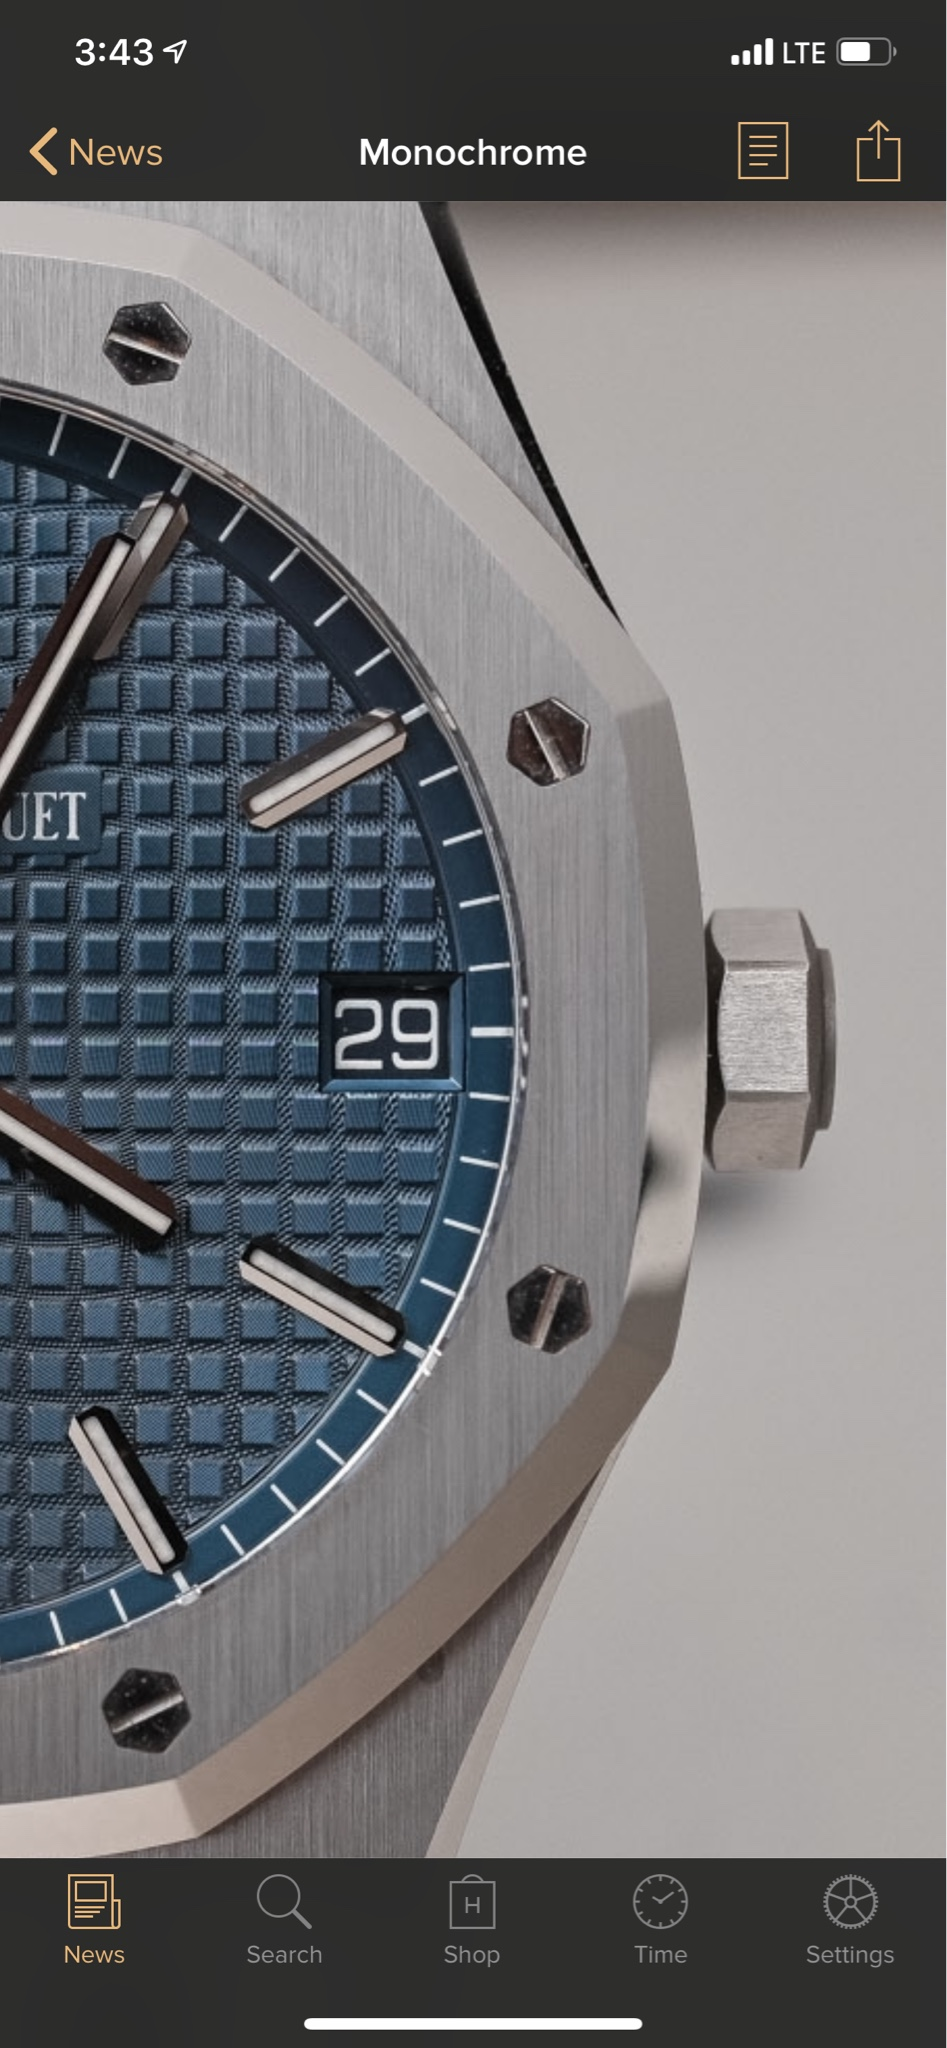 15500 affecting 15400 value - Page 2 - Rolex Forums - Rolex Watch Forum